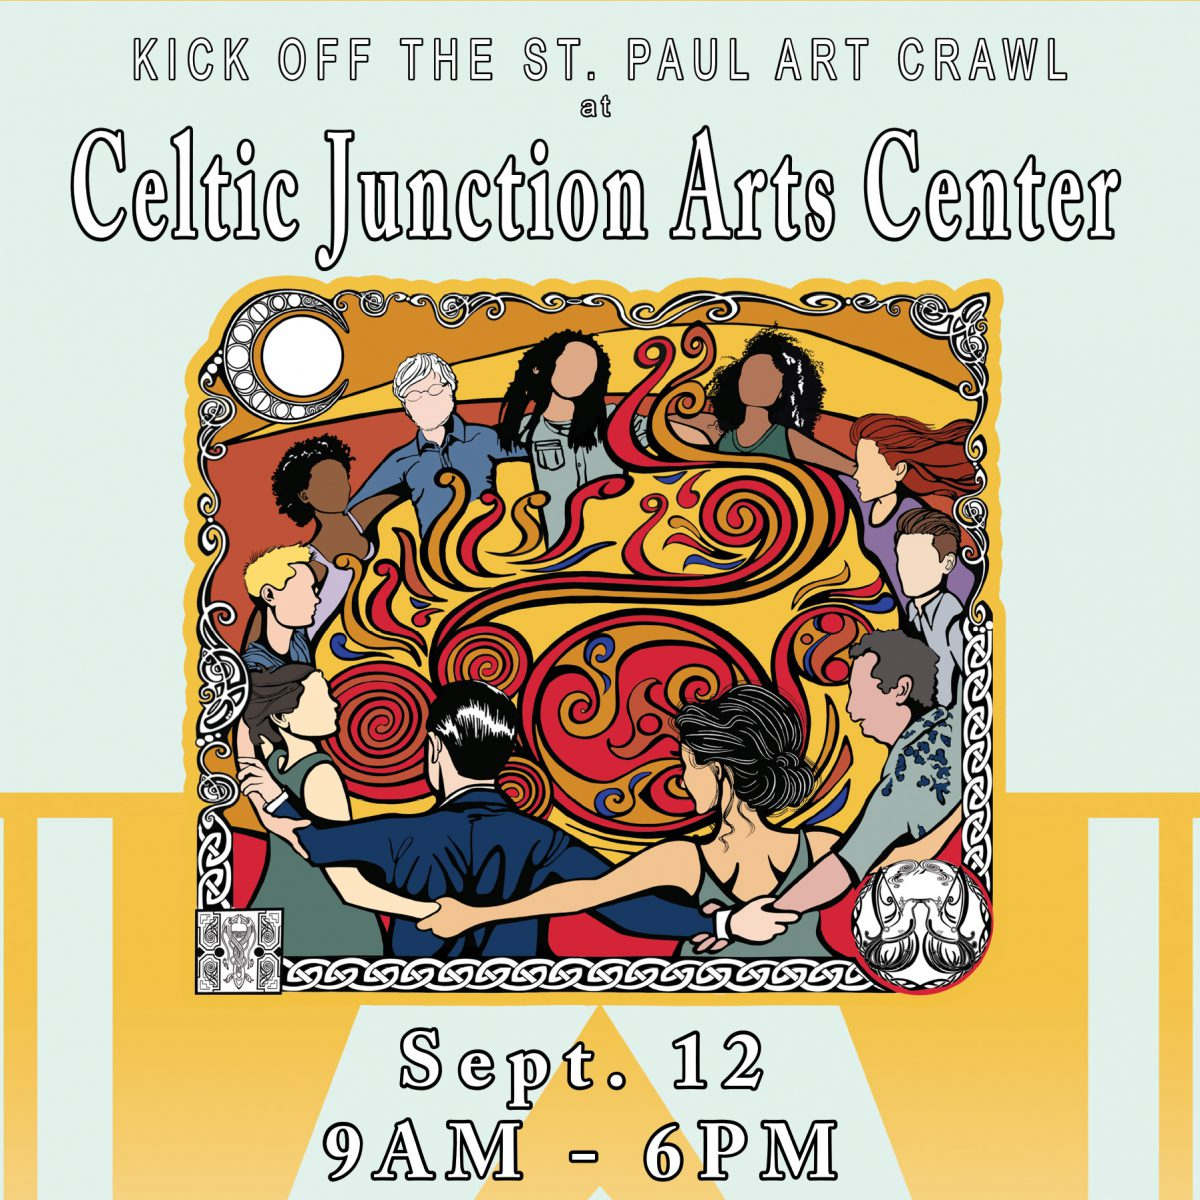 Kick off the St. Paul Art Crawl at Celtic Junction Arts Center